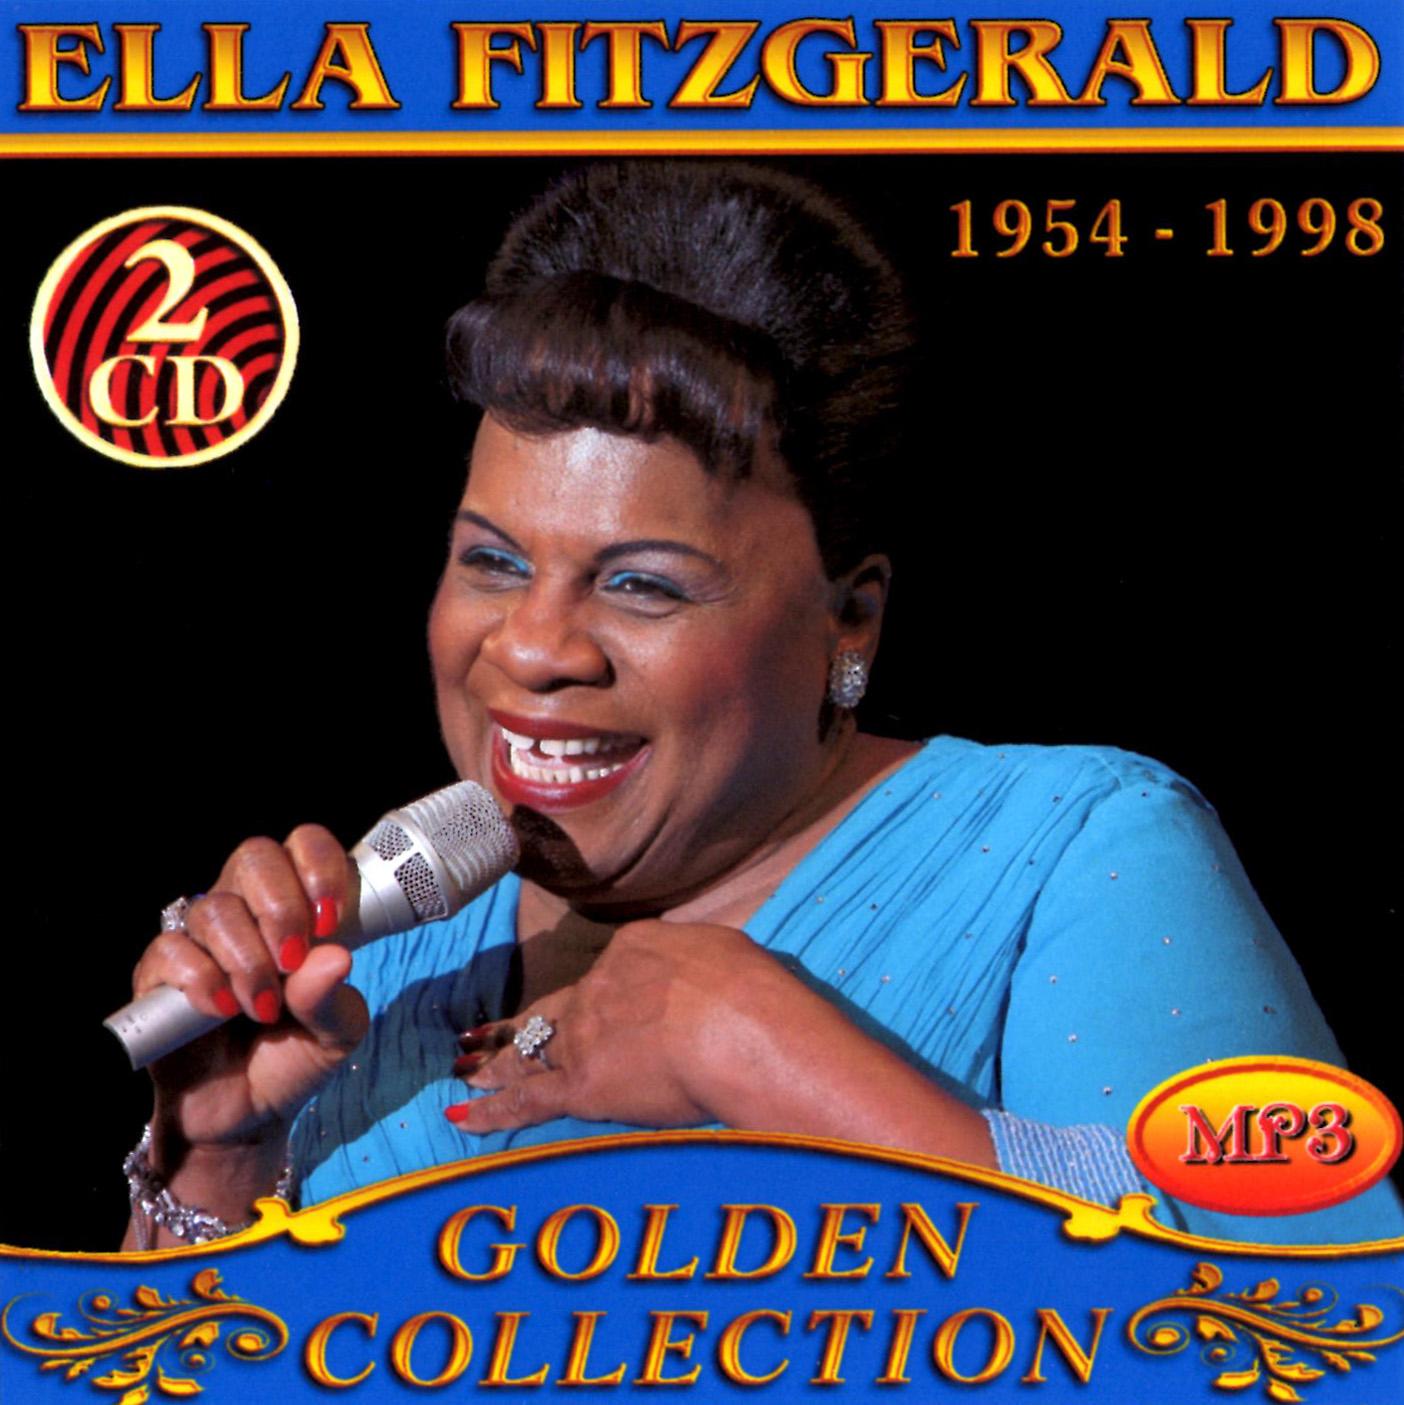 Ella Fitzgerald 2cd [mp3]